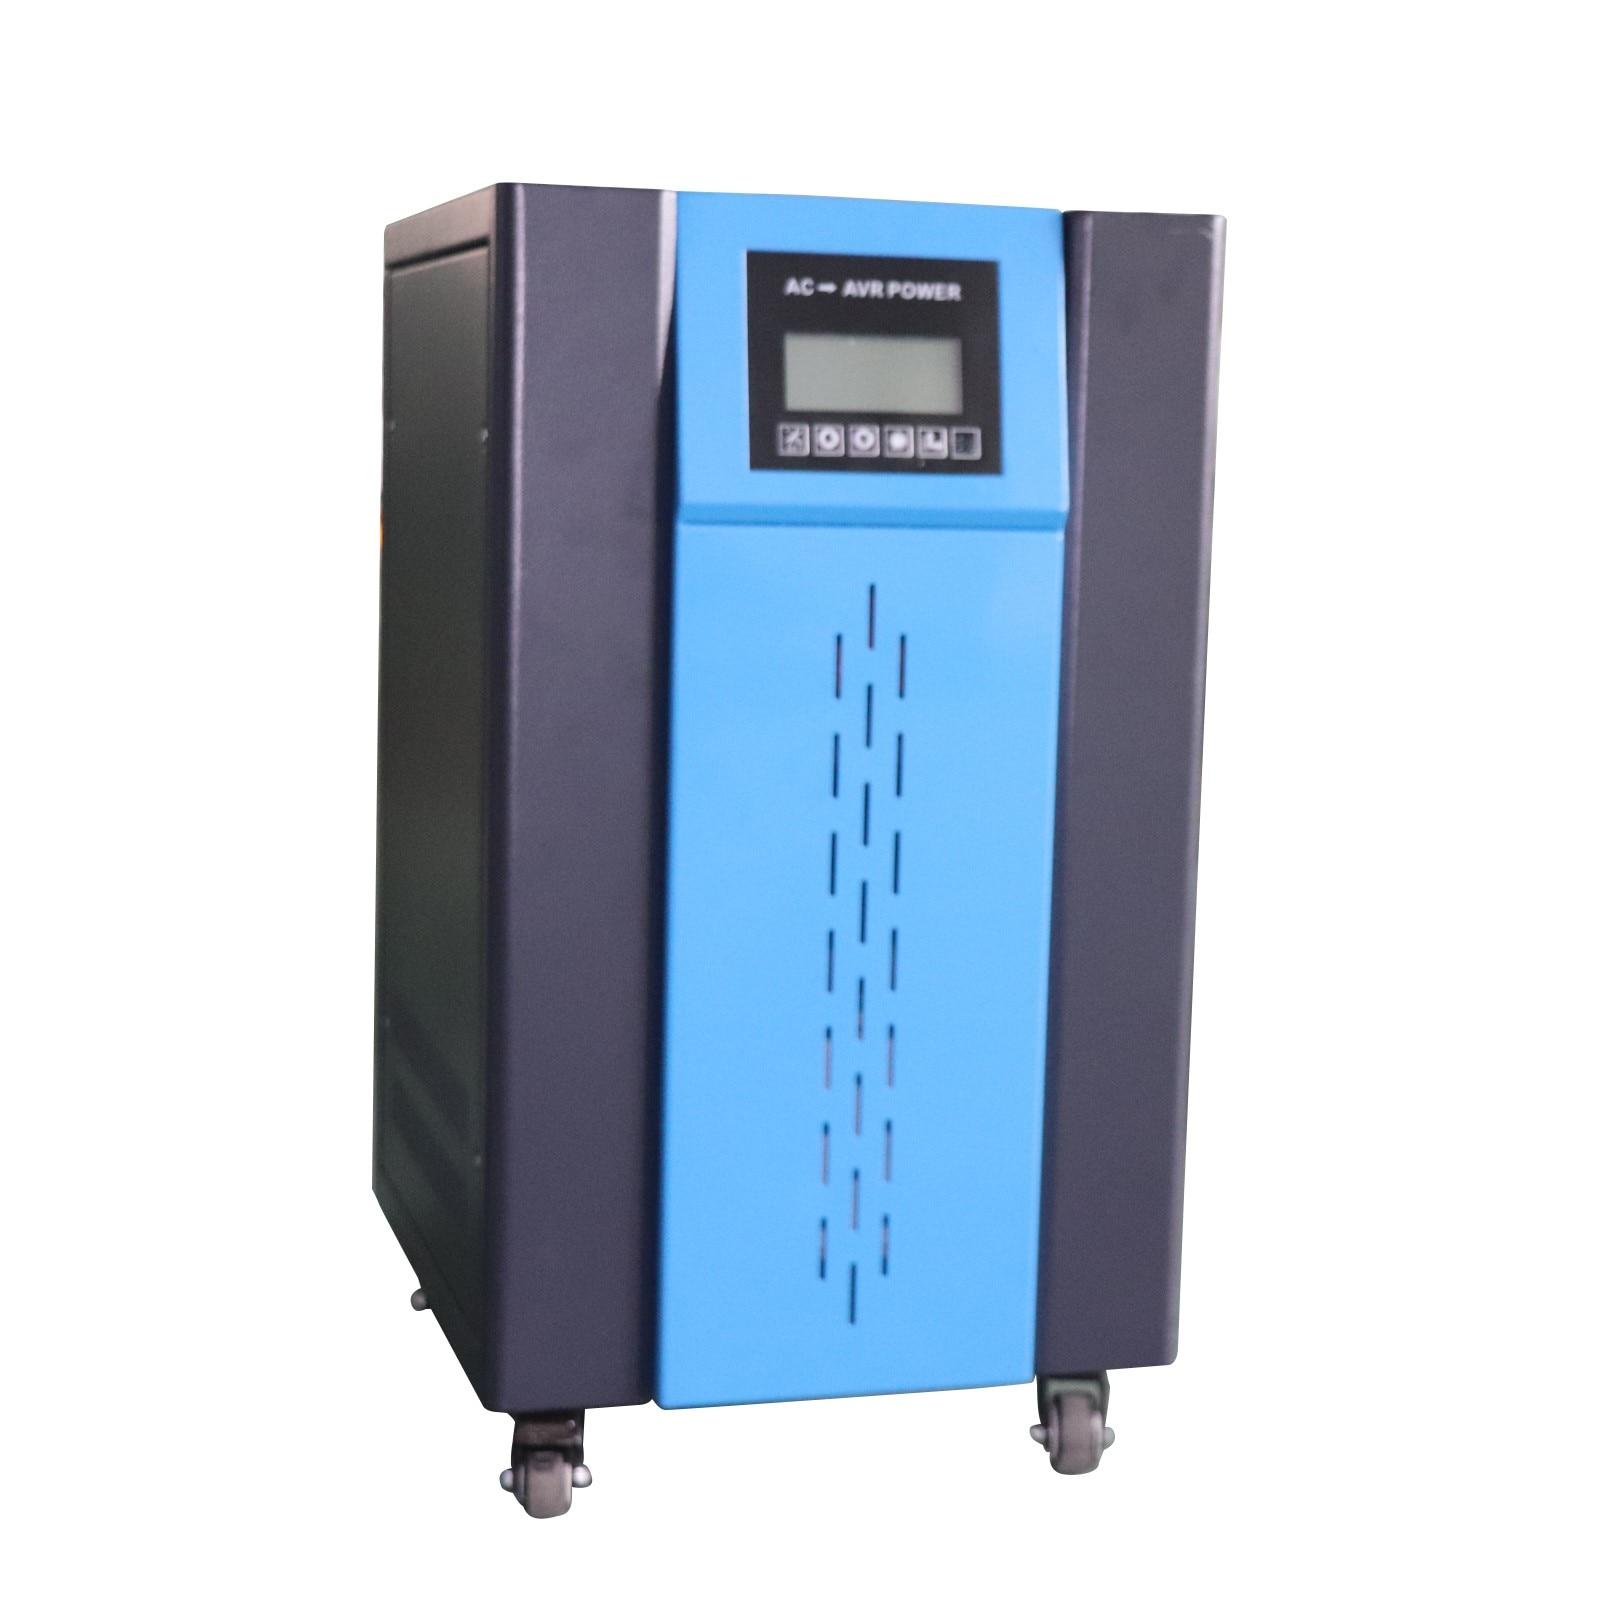 30 kva AVR 220v ac voltage stabilizer 3 phase 380v ac compensated automatic voltage regulator